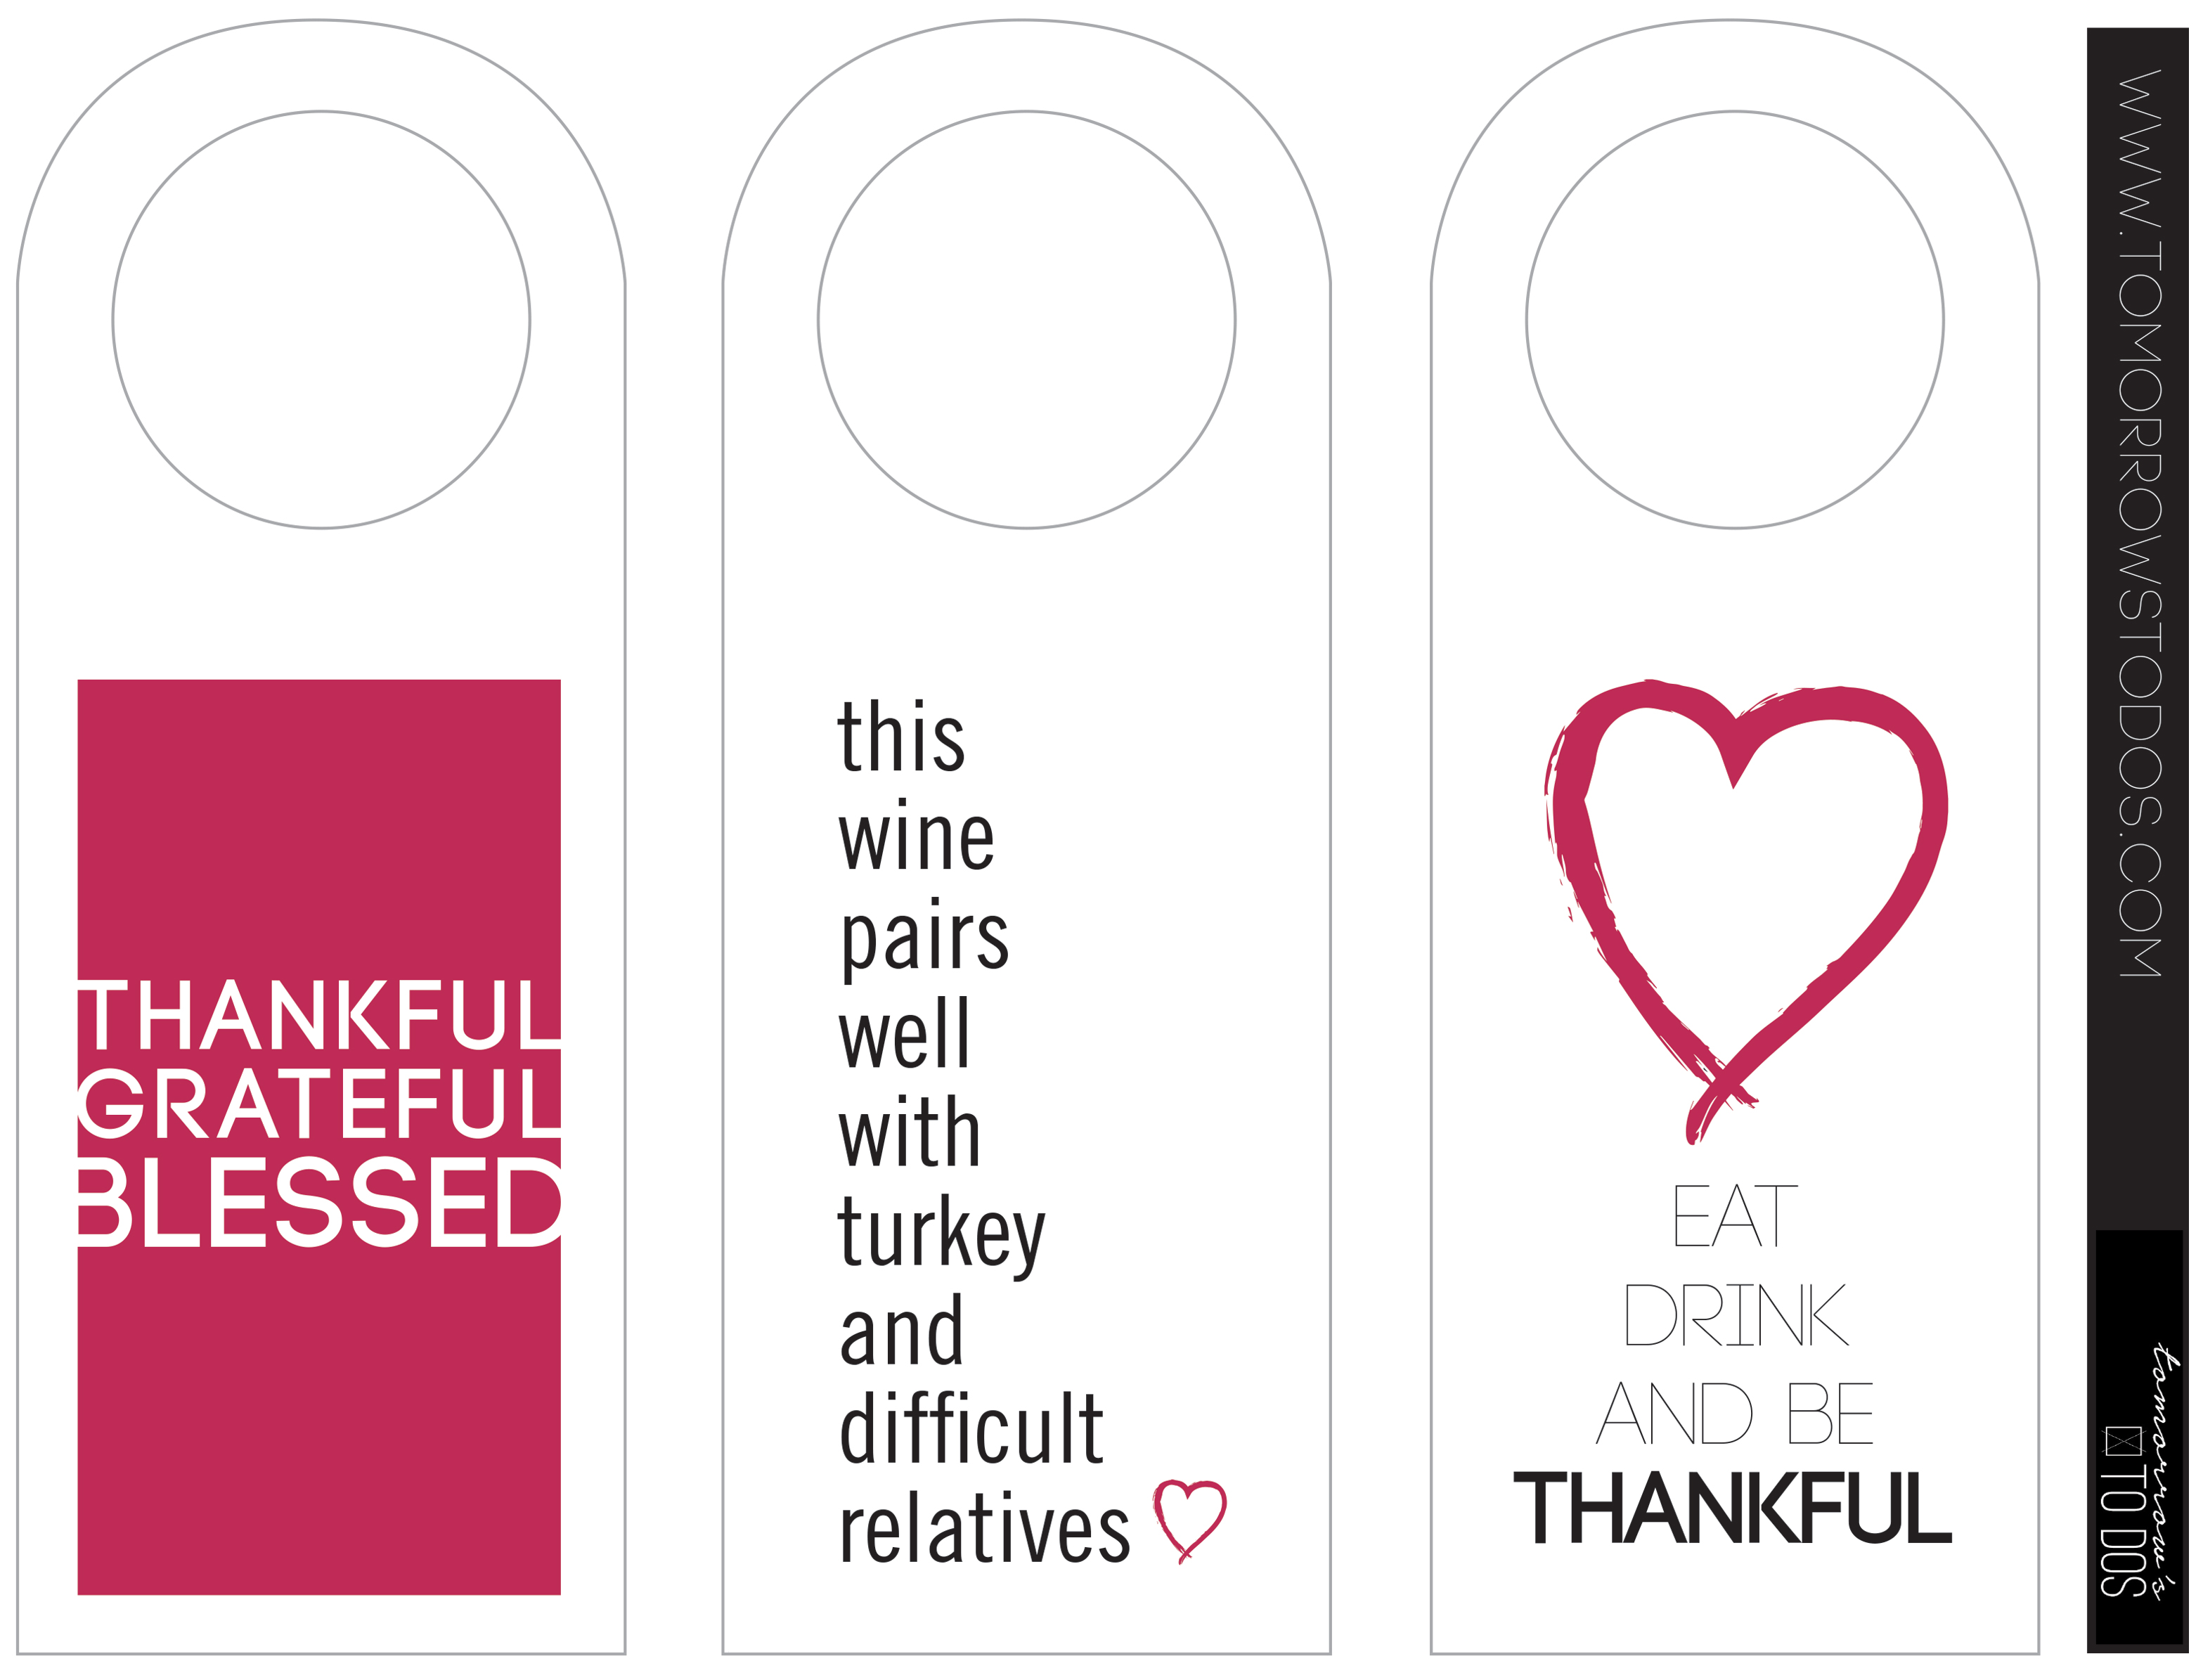 photo regarding Printable Wine Bottle Tags named Thanksgiving Printable Wine Bottle Tags Tomorrows Towards Dos